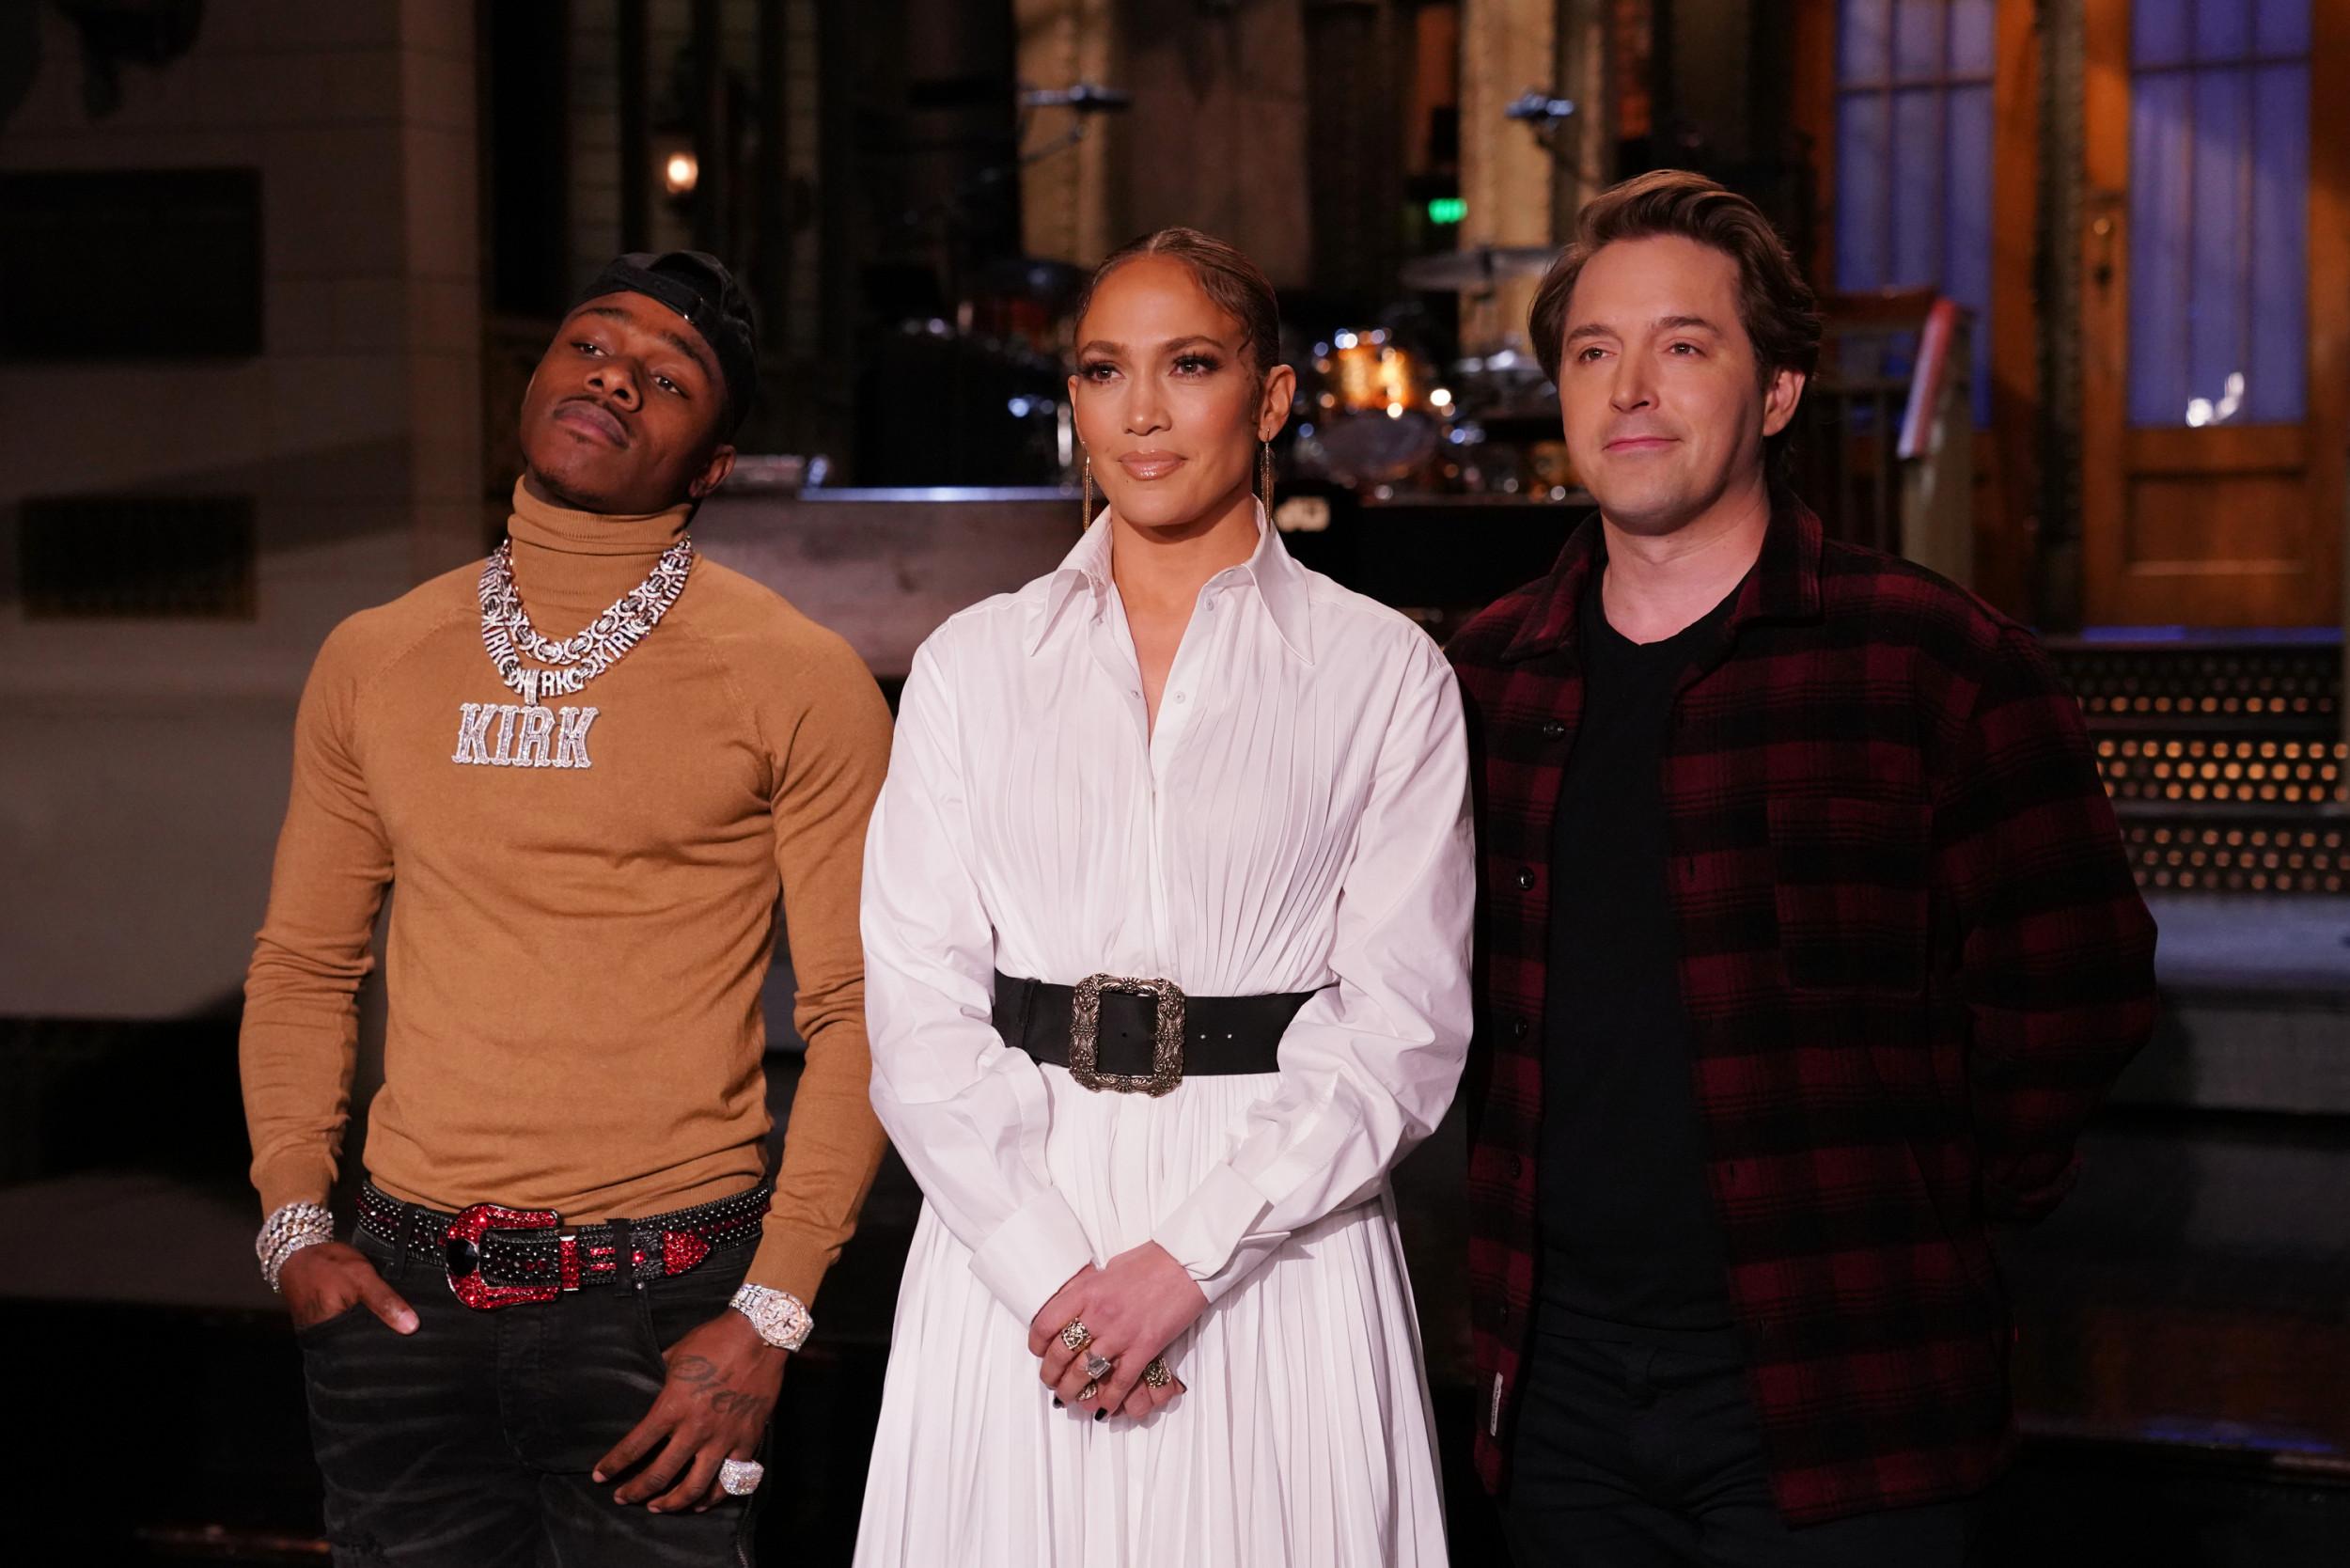 Is Snl On Tonight Watch Jennifer Lopez Host Saturday Night Live